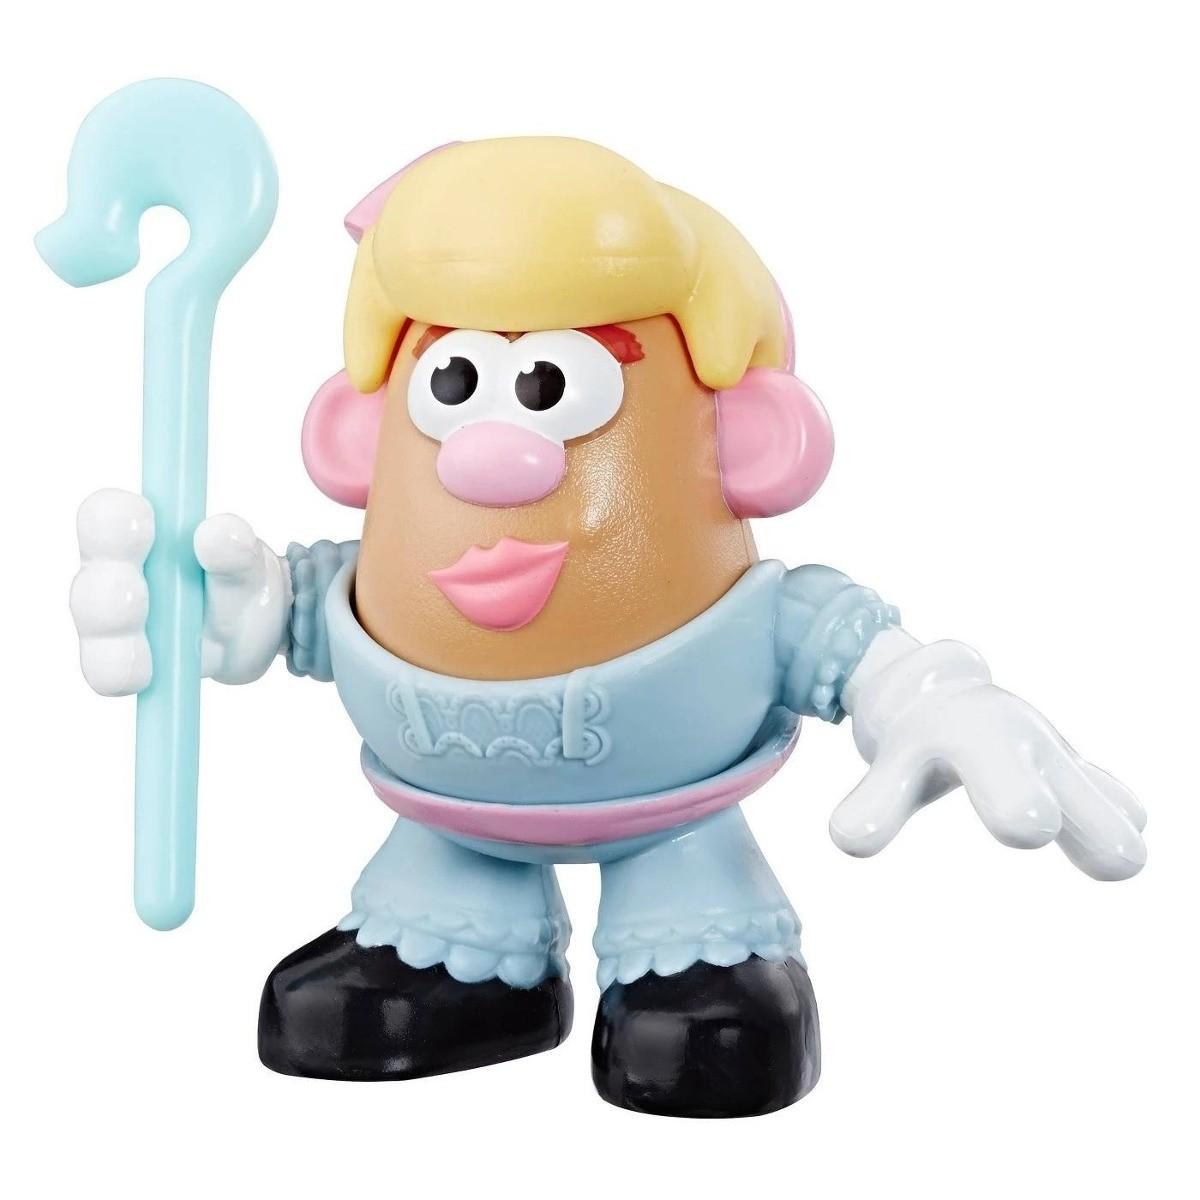 Boneco Mr Potato Head Batata Mini Toy Story 4 -  Sortidos - Hasbro